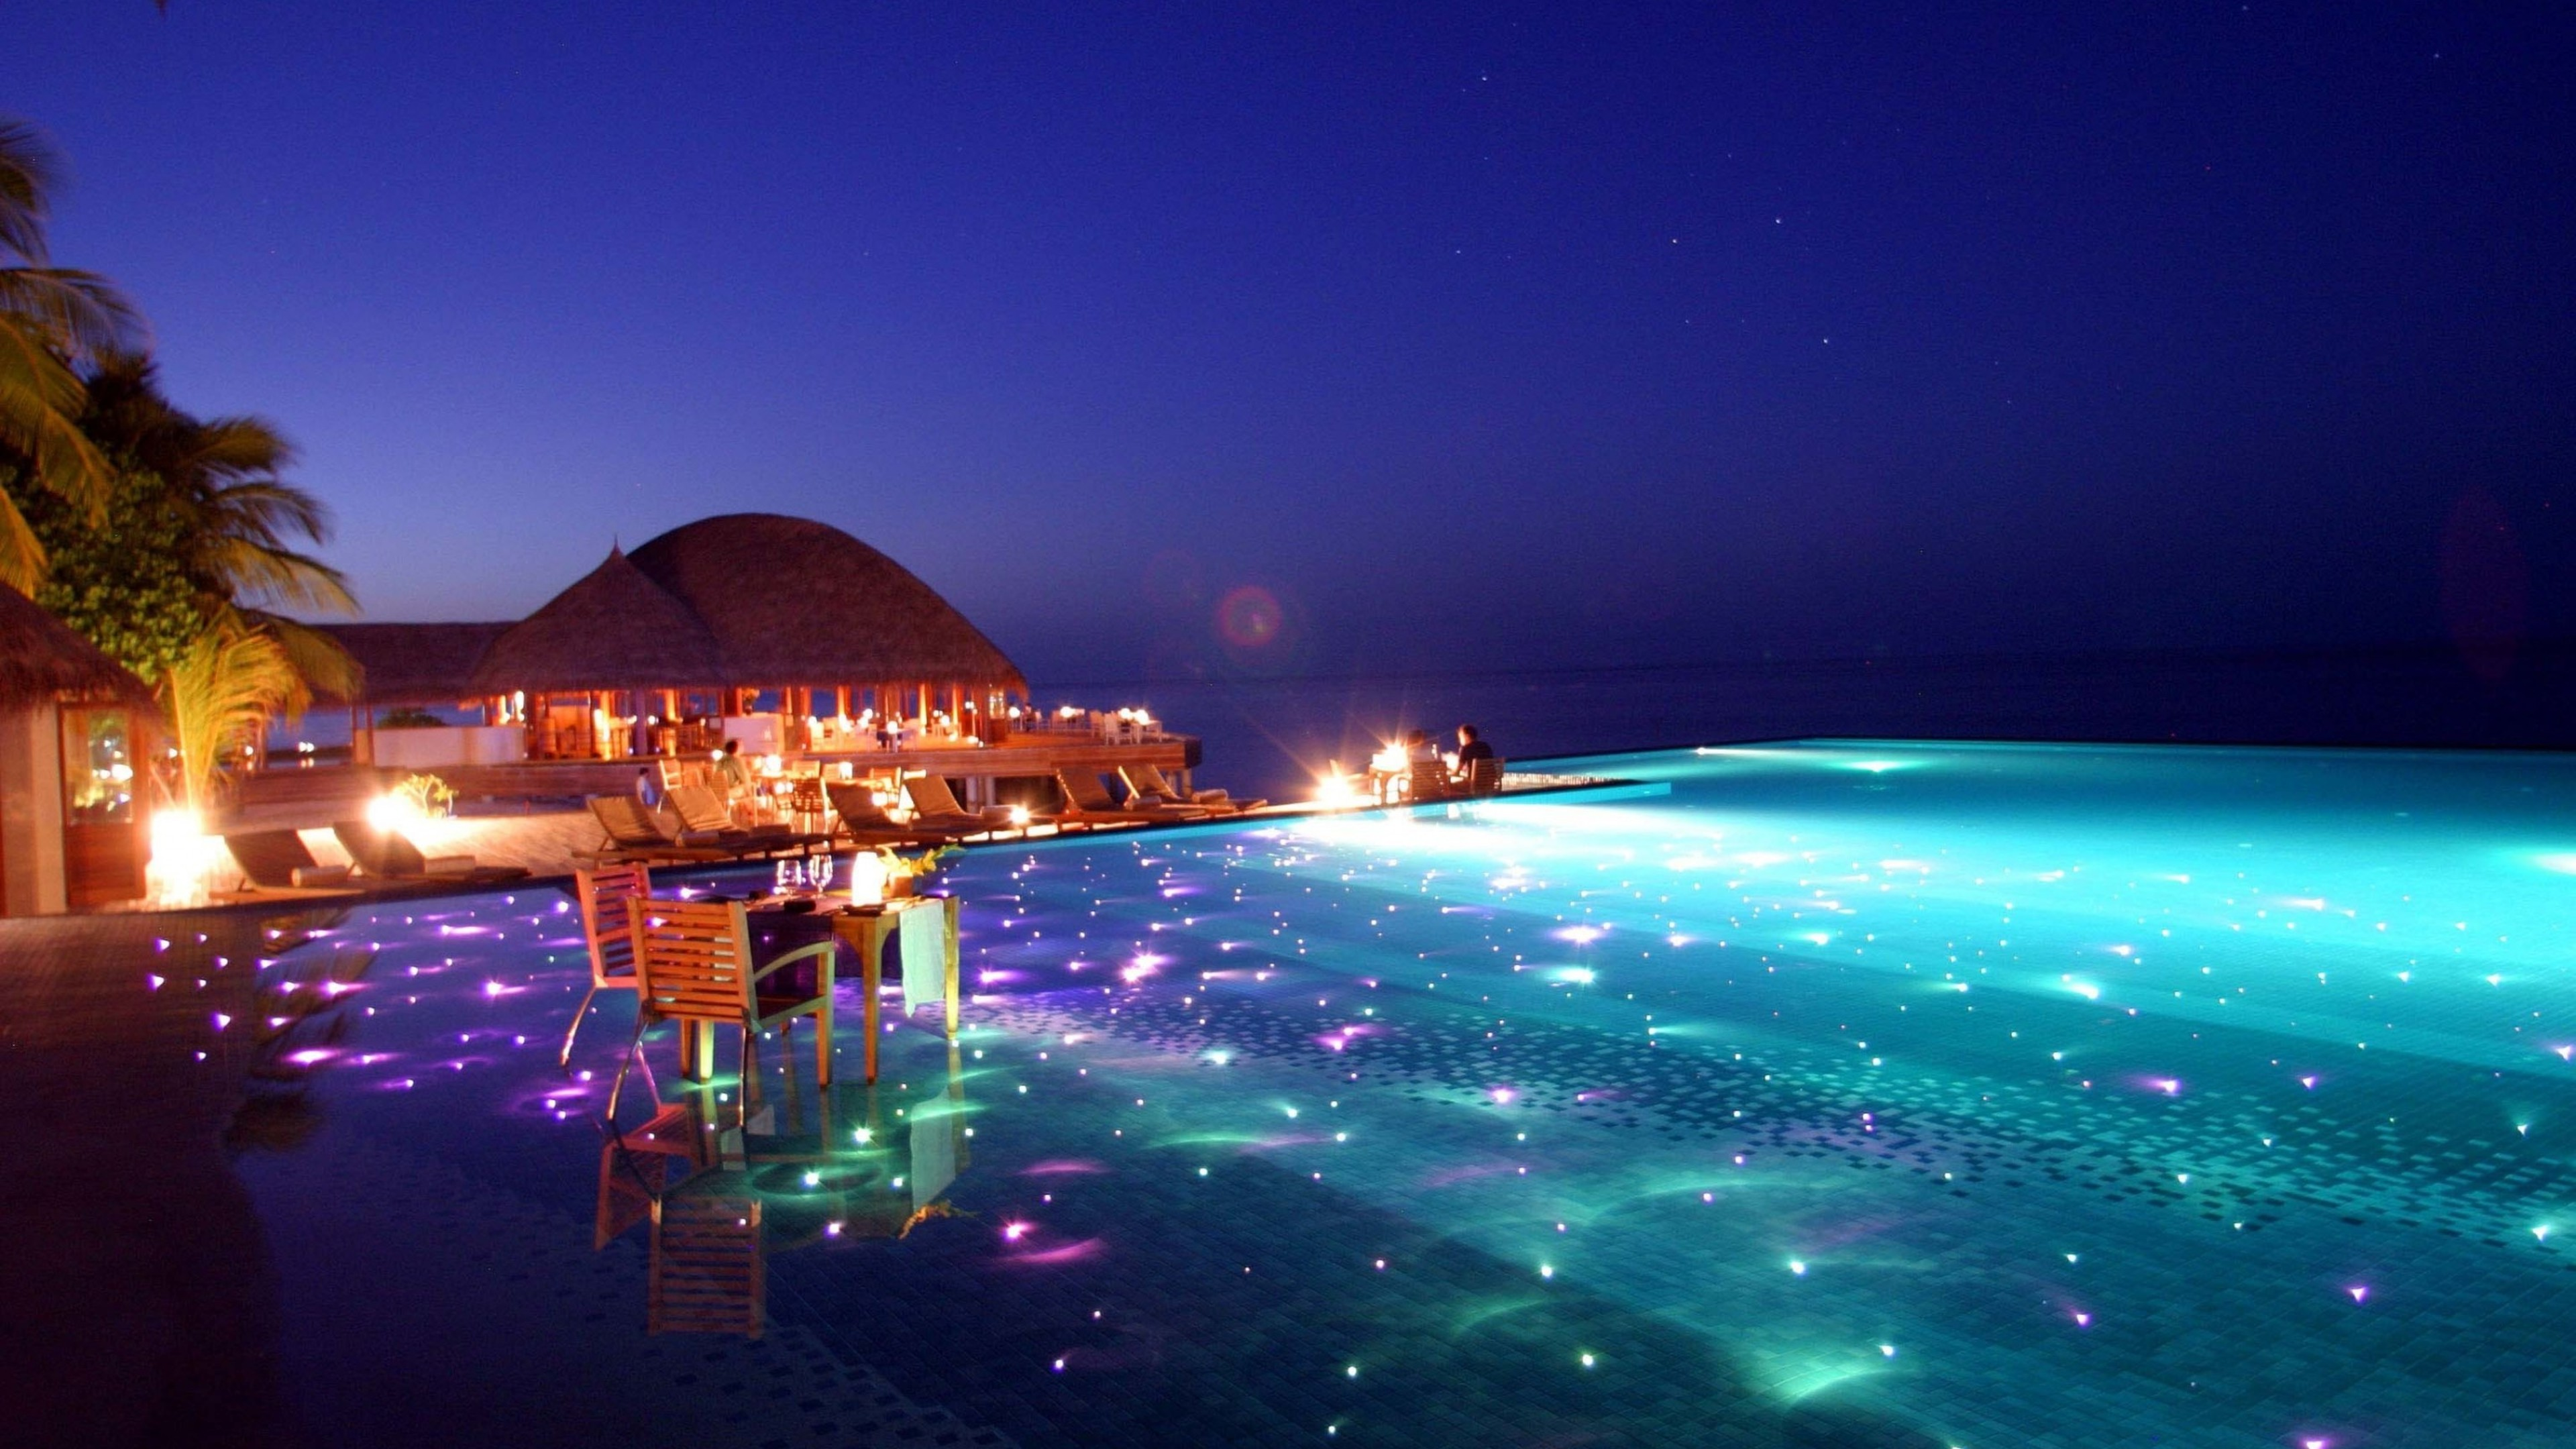 amazing beautiful places 1538069102 - Amazing Beautiful Places - beautiful place wallpapers, beach wallpapers